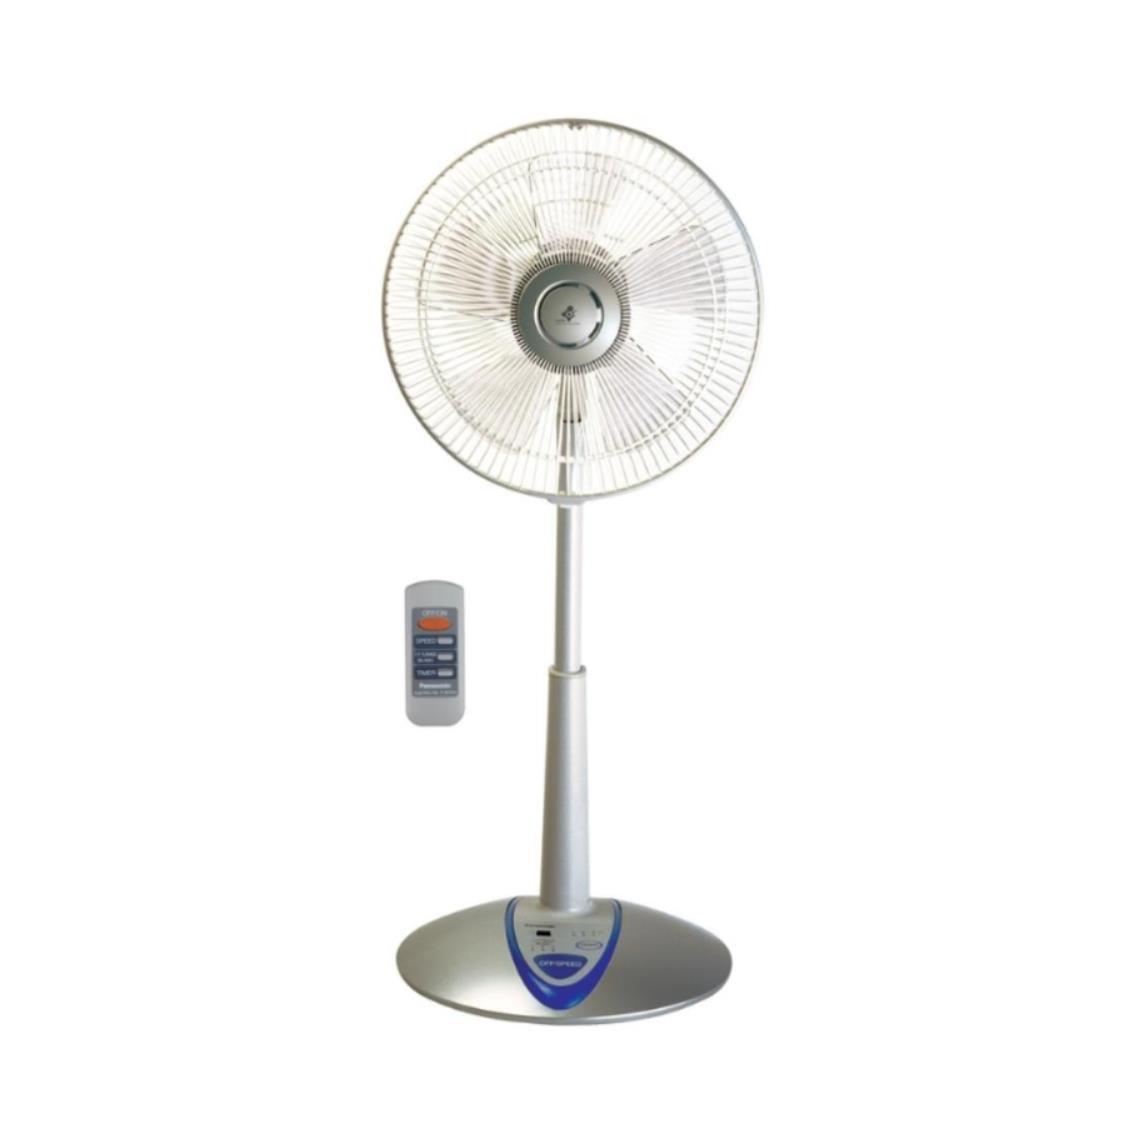 Panasonic Electric Living Fan W Remote Control 12 F-307KHT